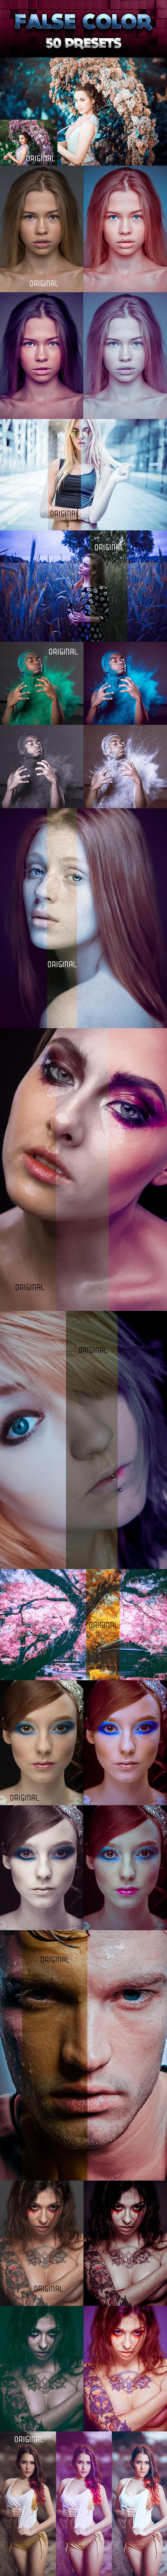 50 False Color Presets - Portrait Lightroom Presets